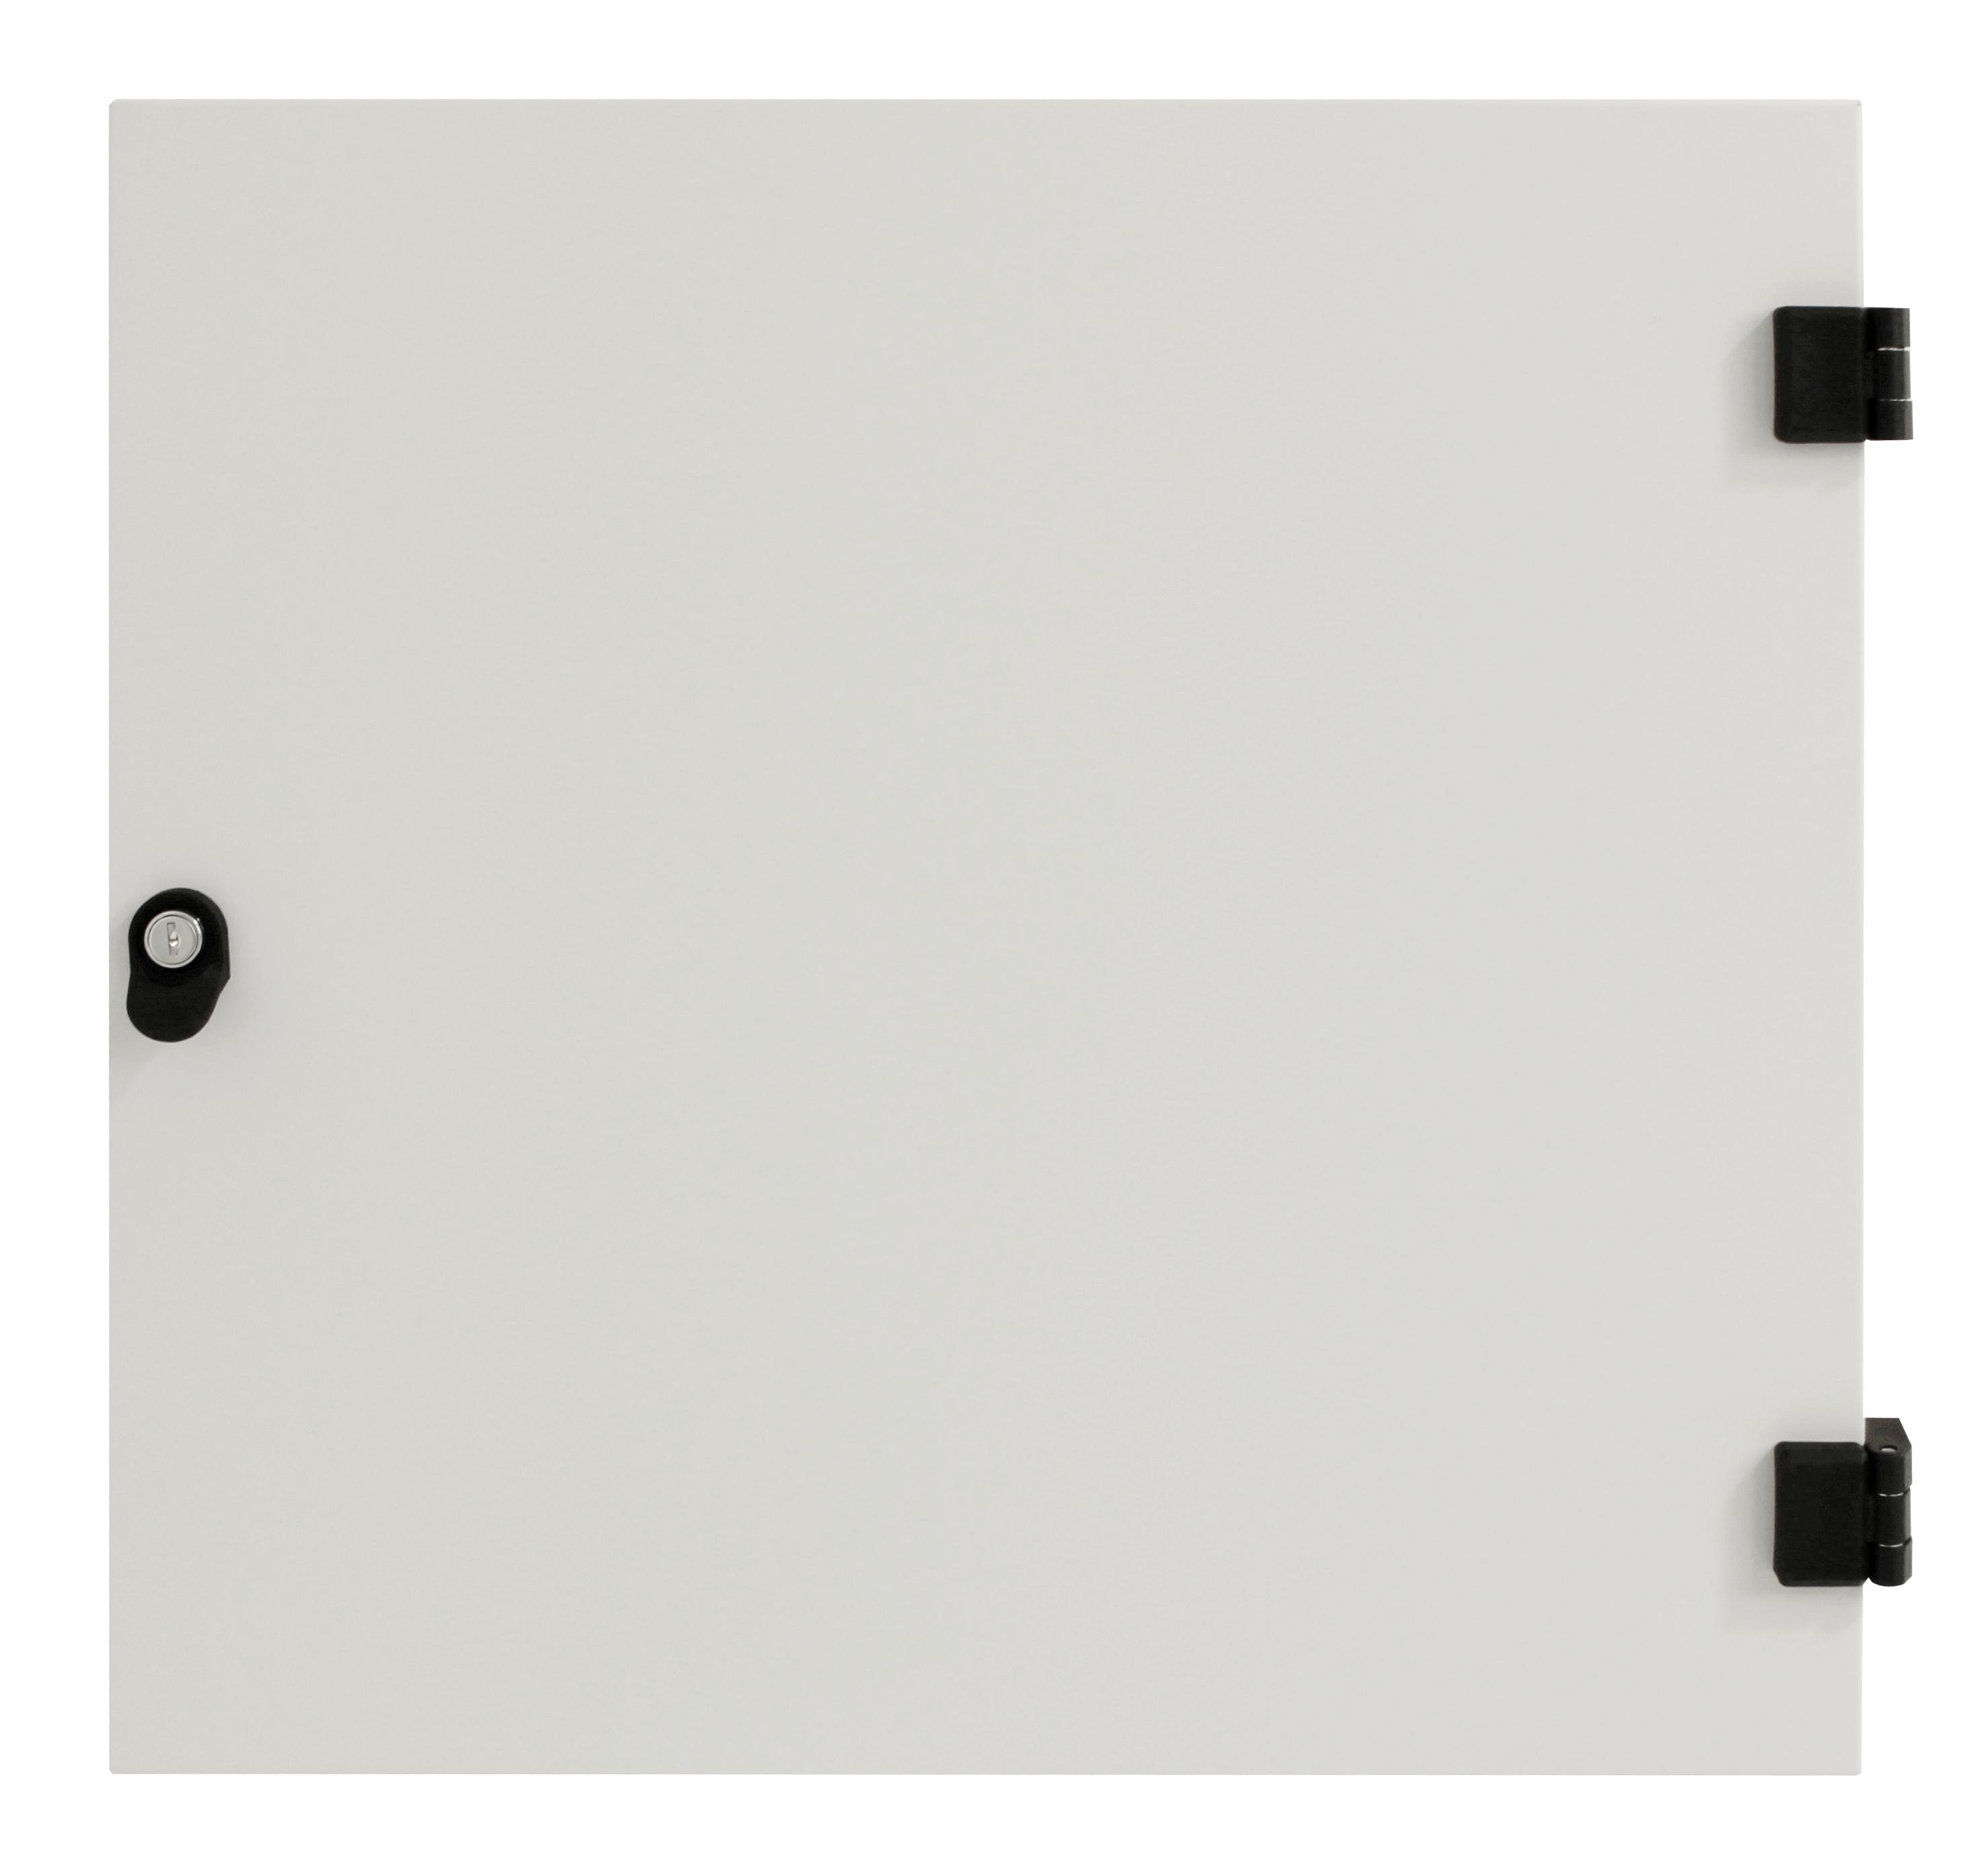 1 Stk Metall-Tür voll für DW-Schrank 12HE, B=600, RAL7035 DWRT1260--